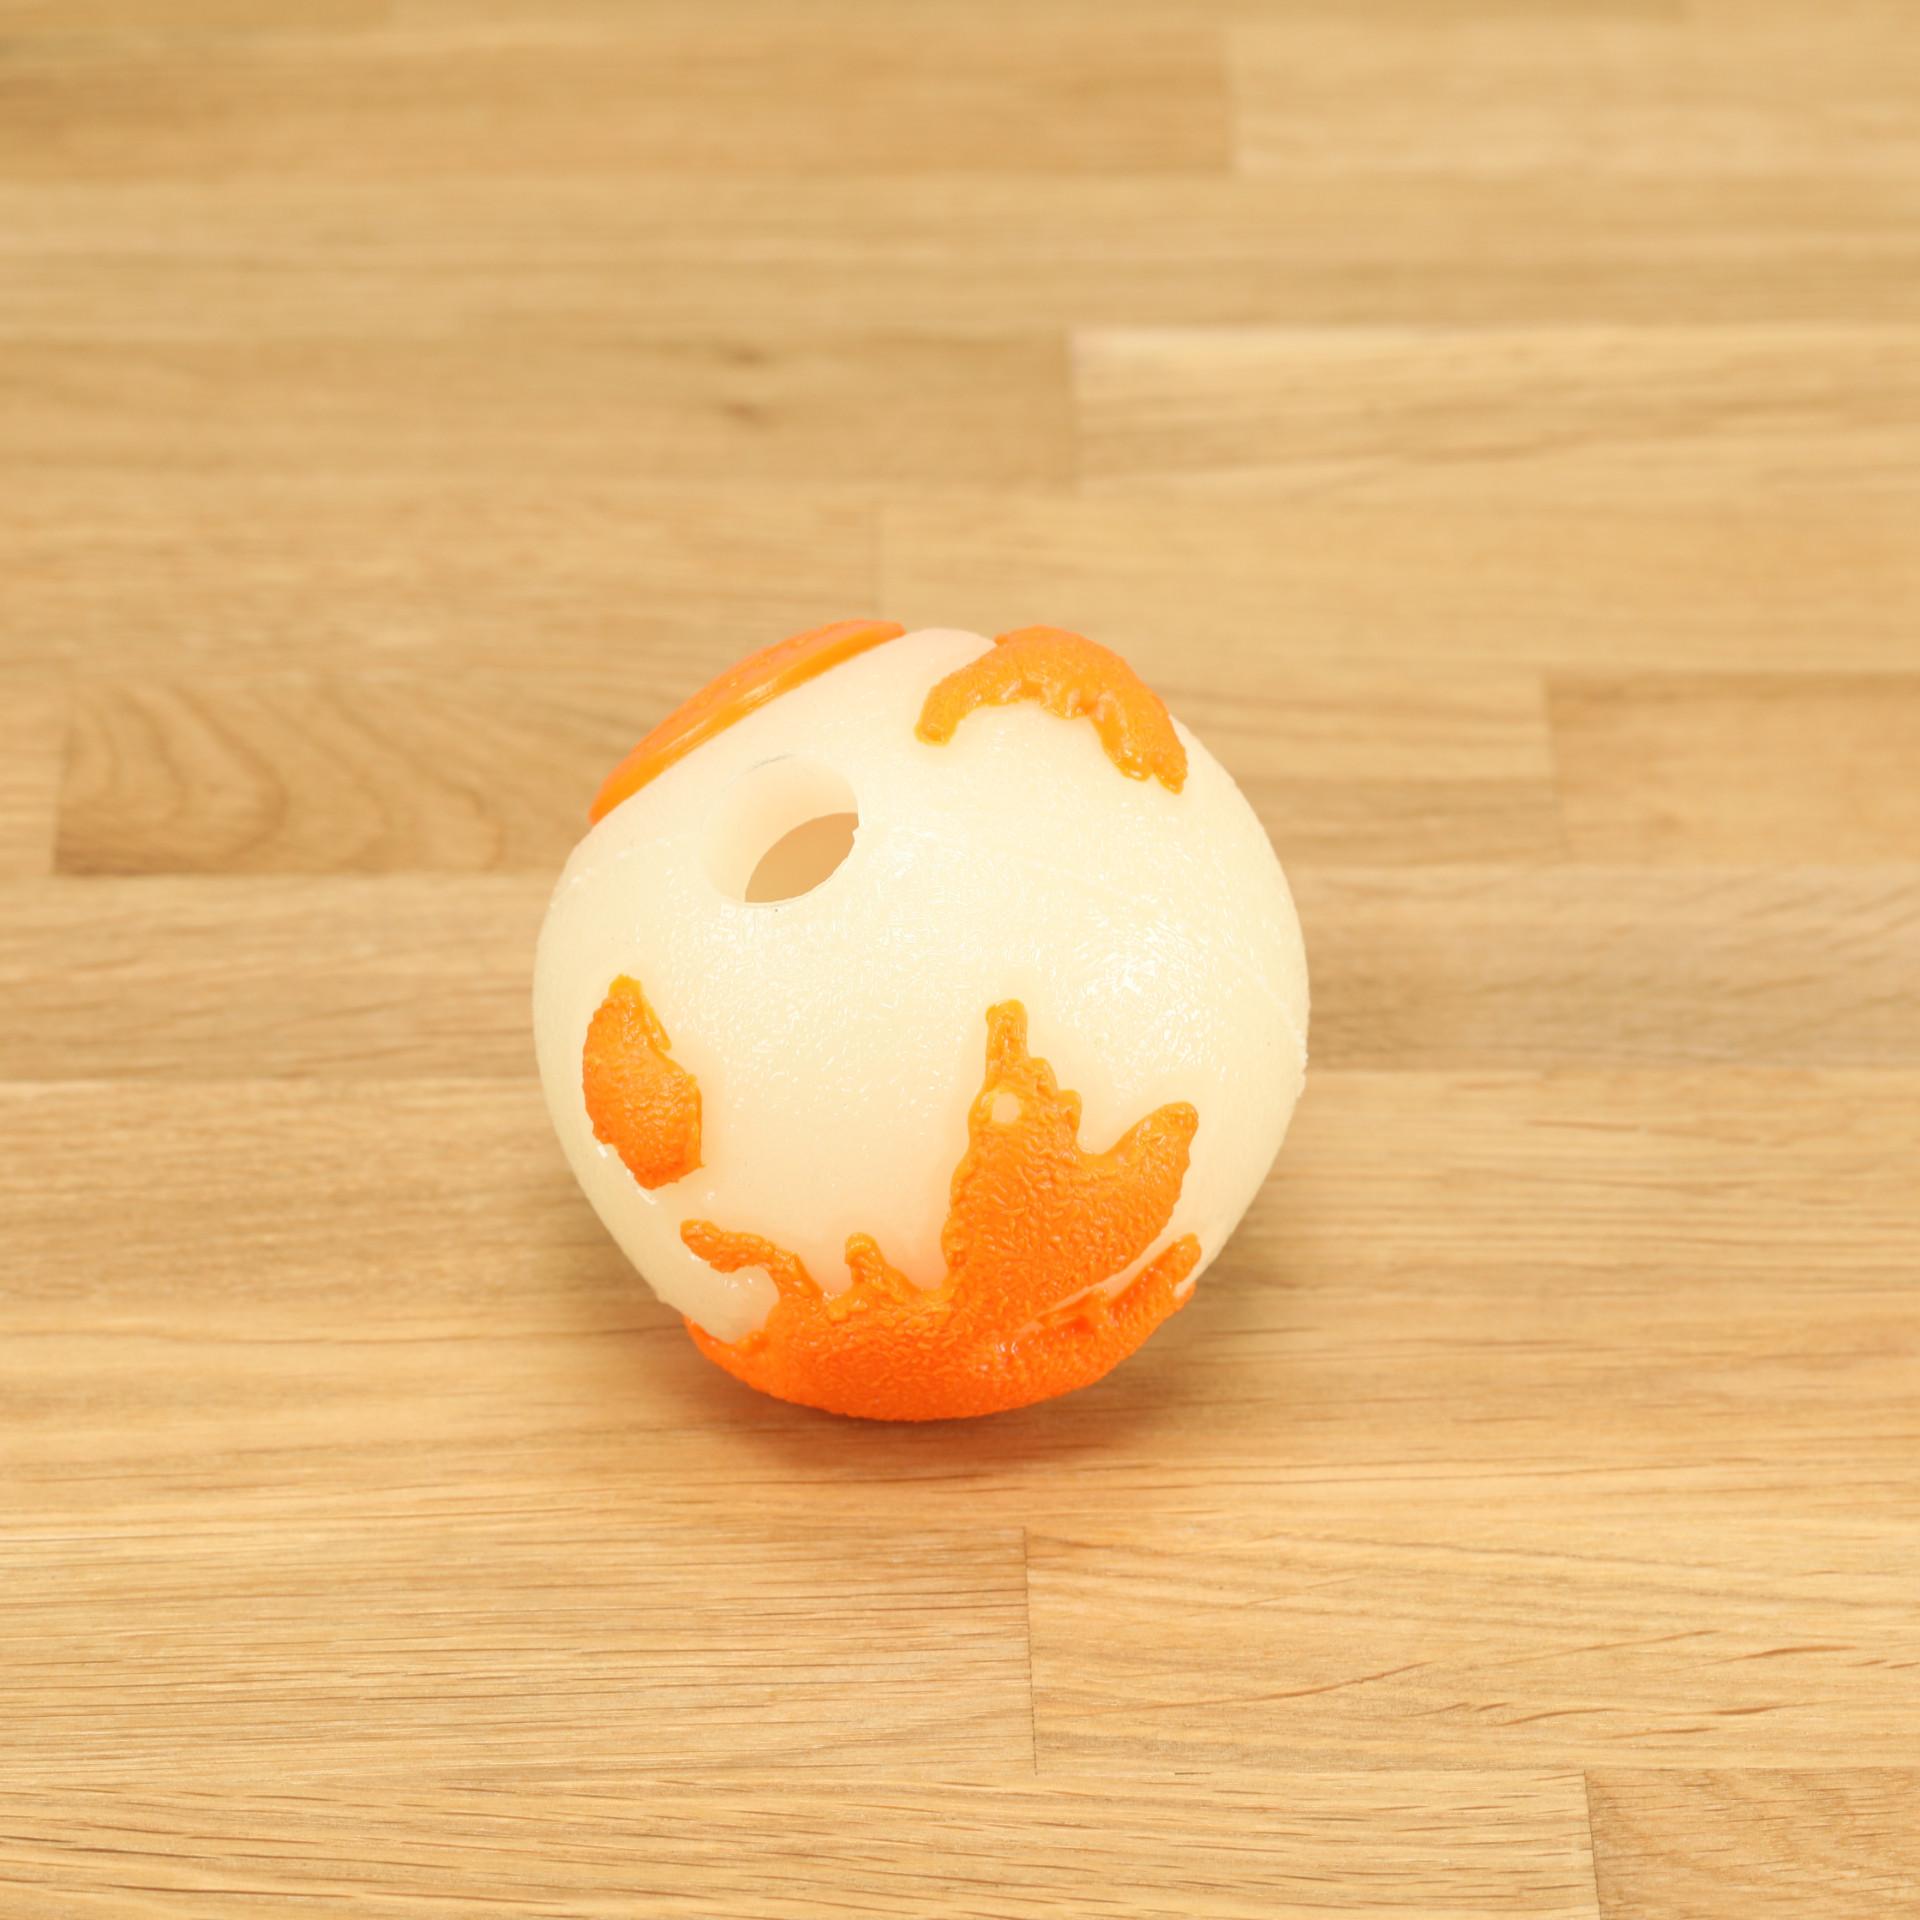 Hundespielzeug Orbee Ball leuchtend/orange